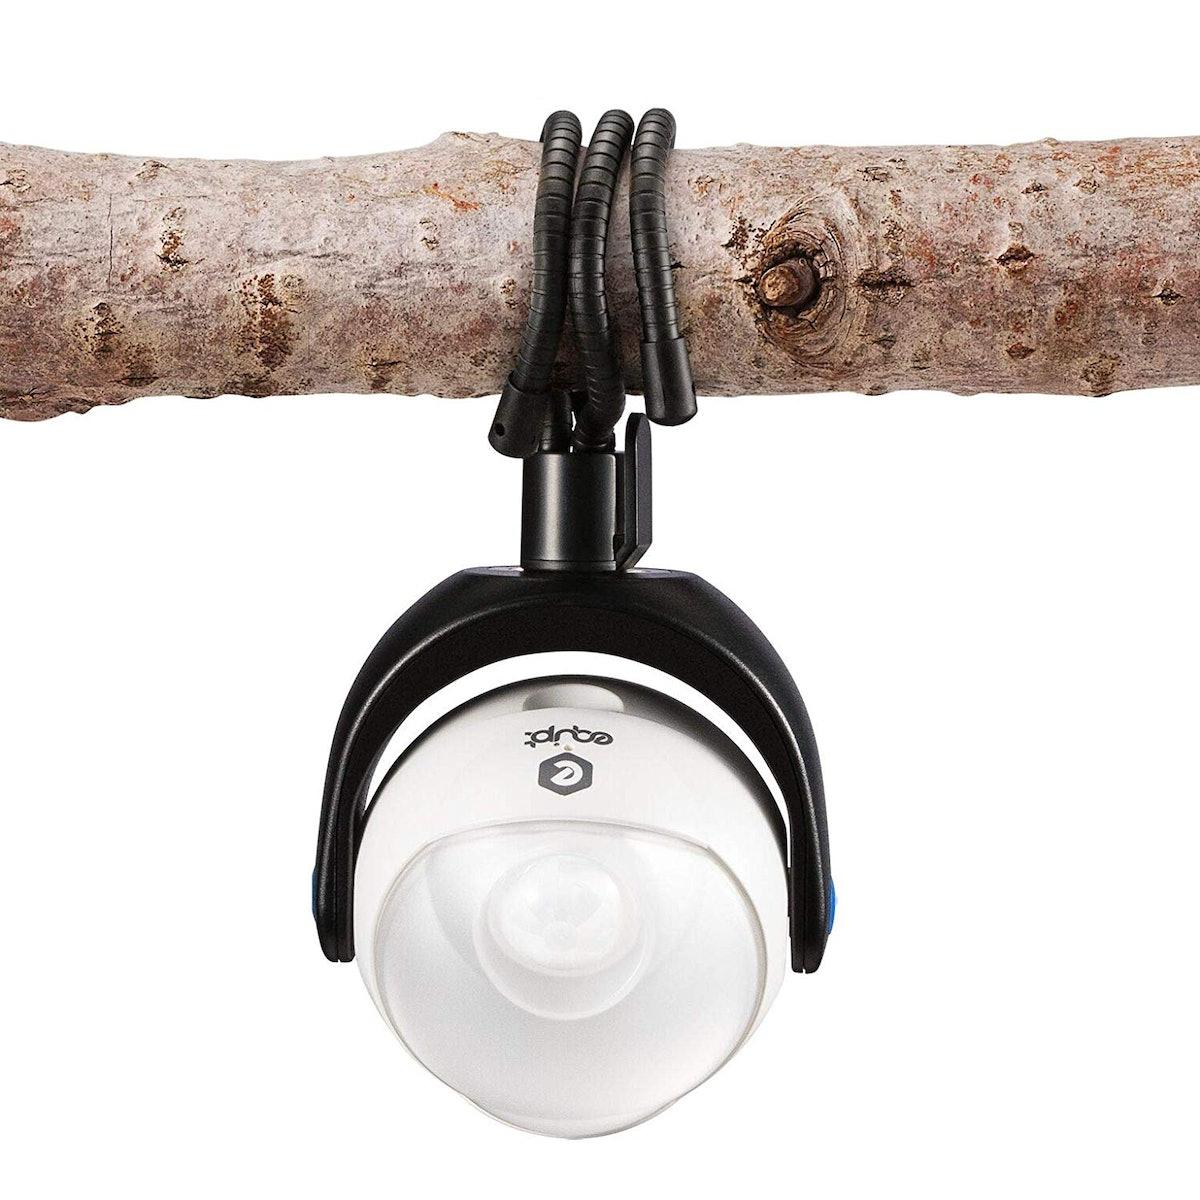 Spy Tec Equipt Sensor Light